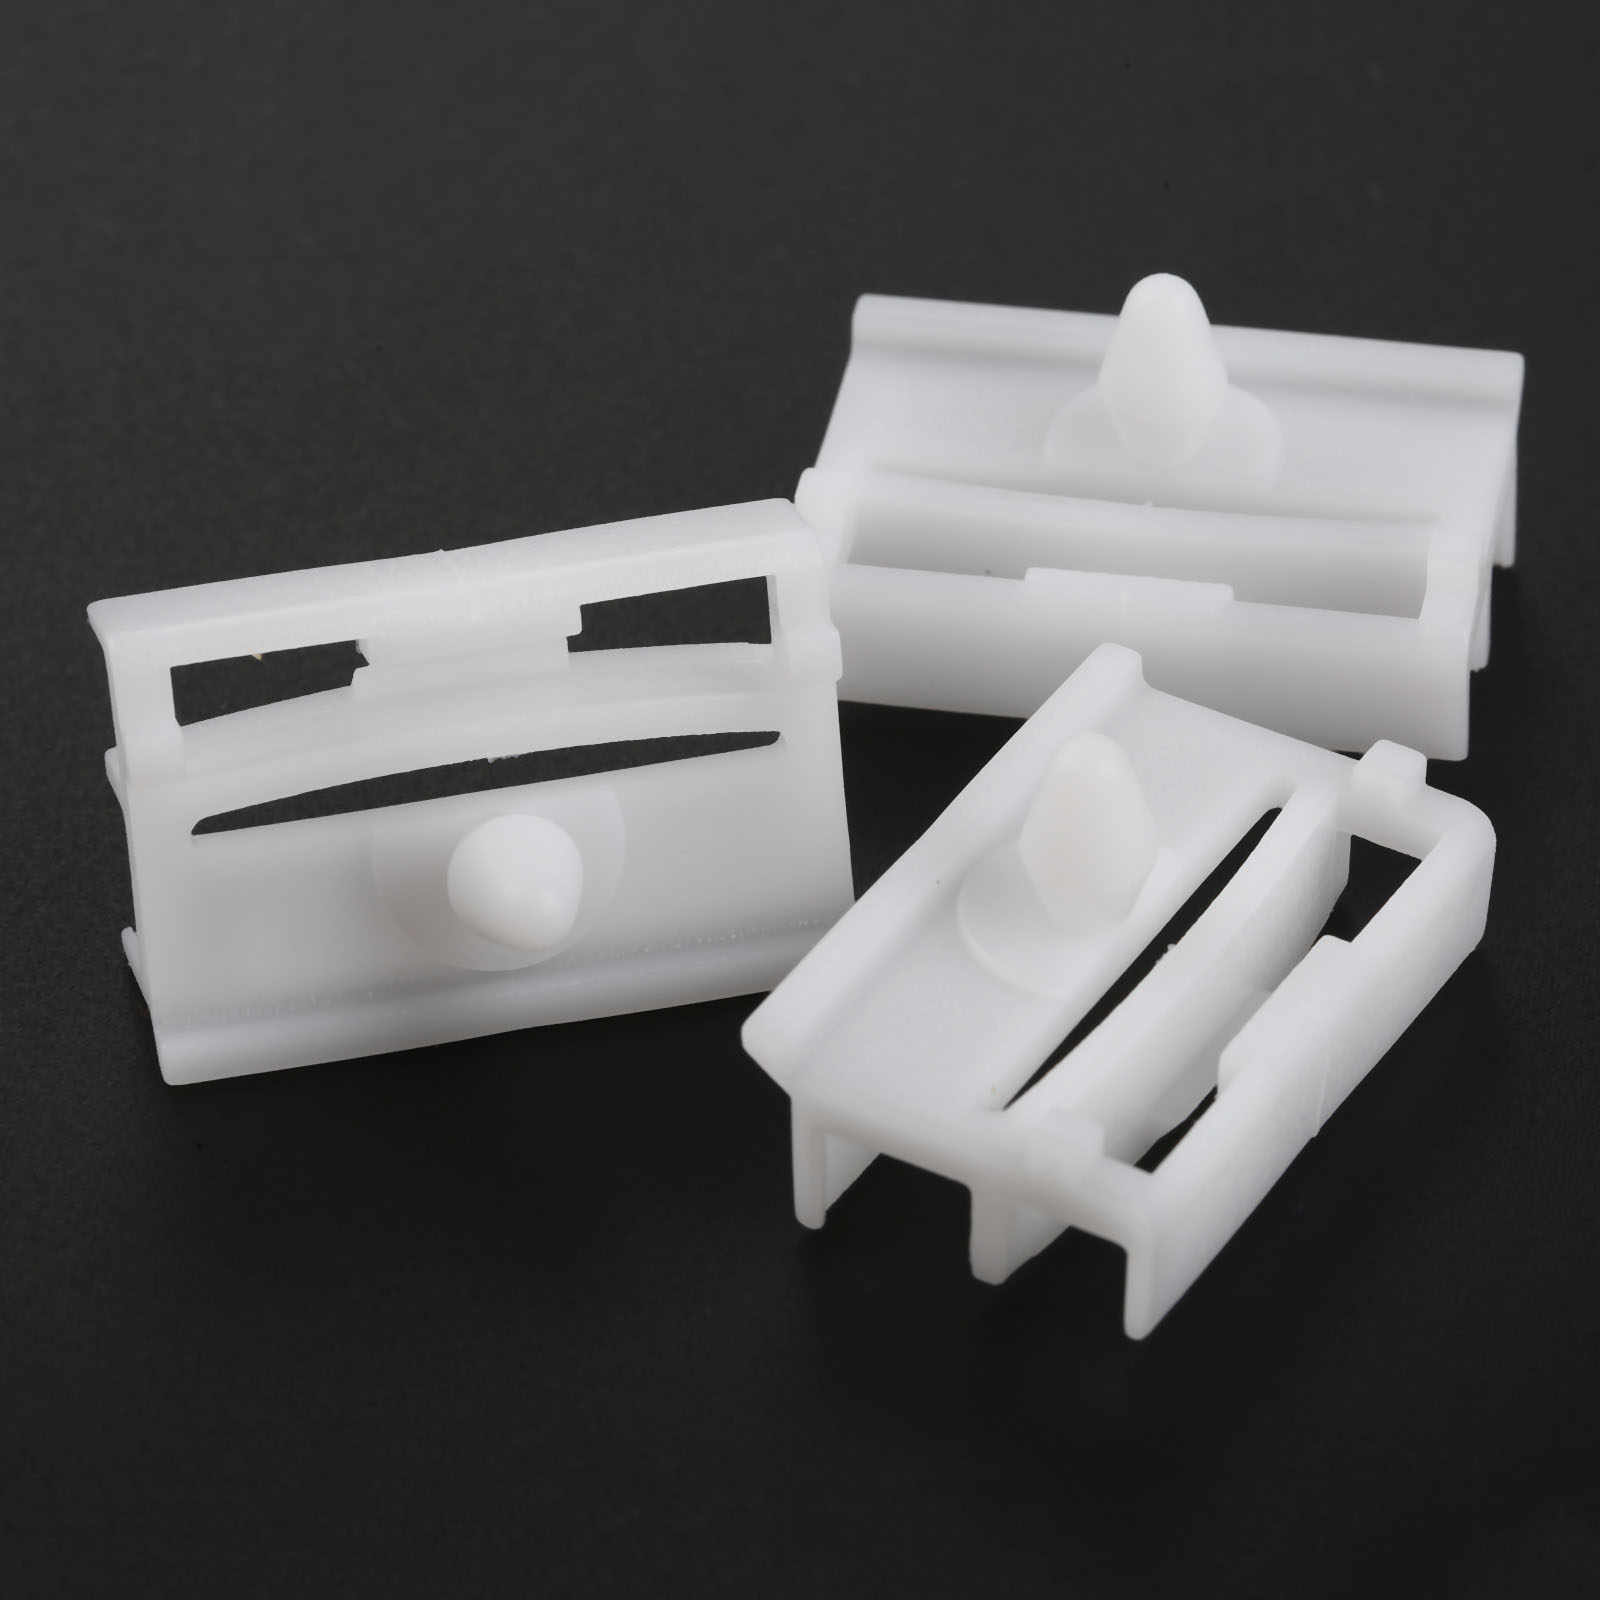 10Pcs Sill Samping Rok Moulding Klip Door Trim Panel Pengikat Klip 51718184574 untuk BMW E36 E46 Mobil Plastik Paku Keling mobil